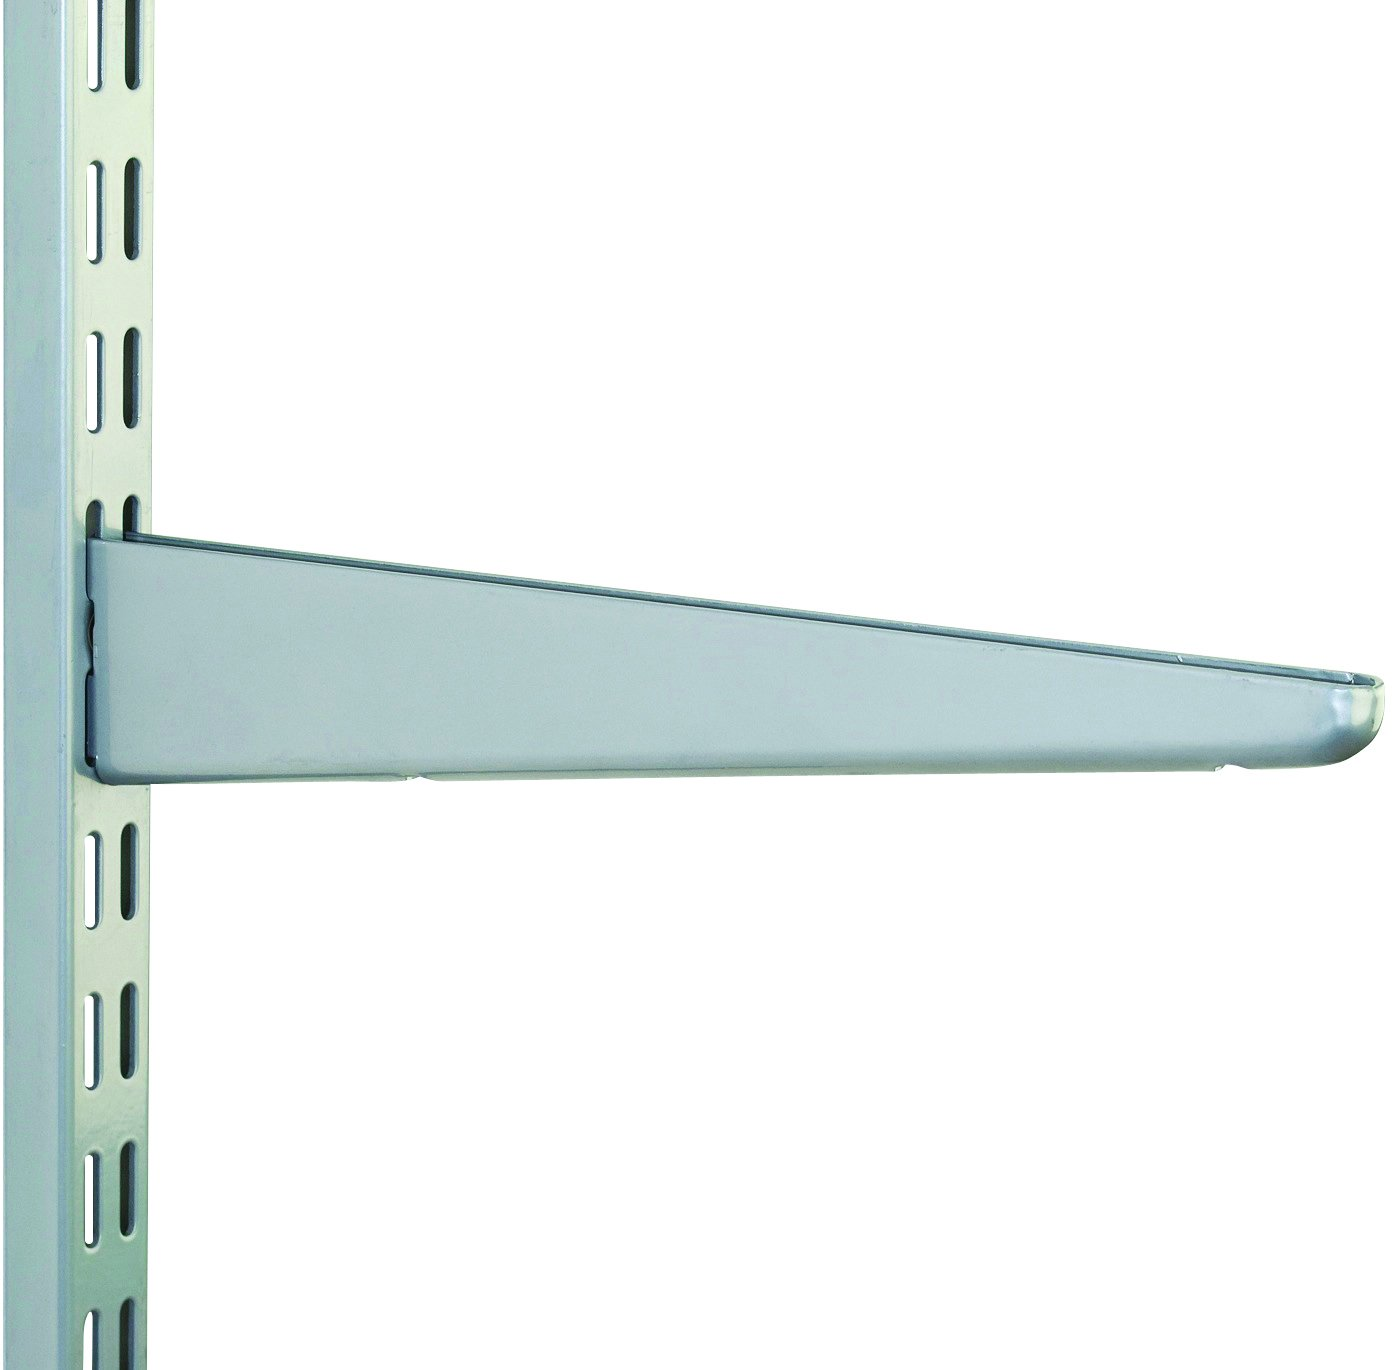 10 Pack 120mm Matt Silver Watson Twin Slot Shelving Bracket Watson Lok Twin Slot Shelving